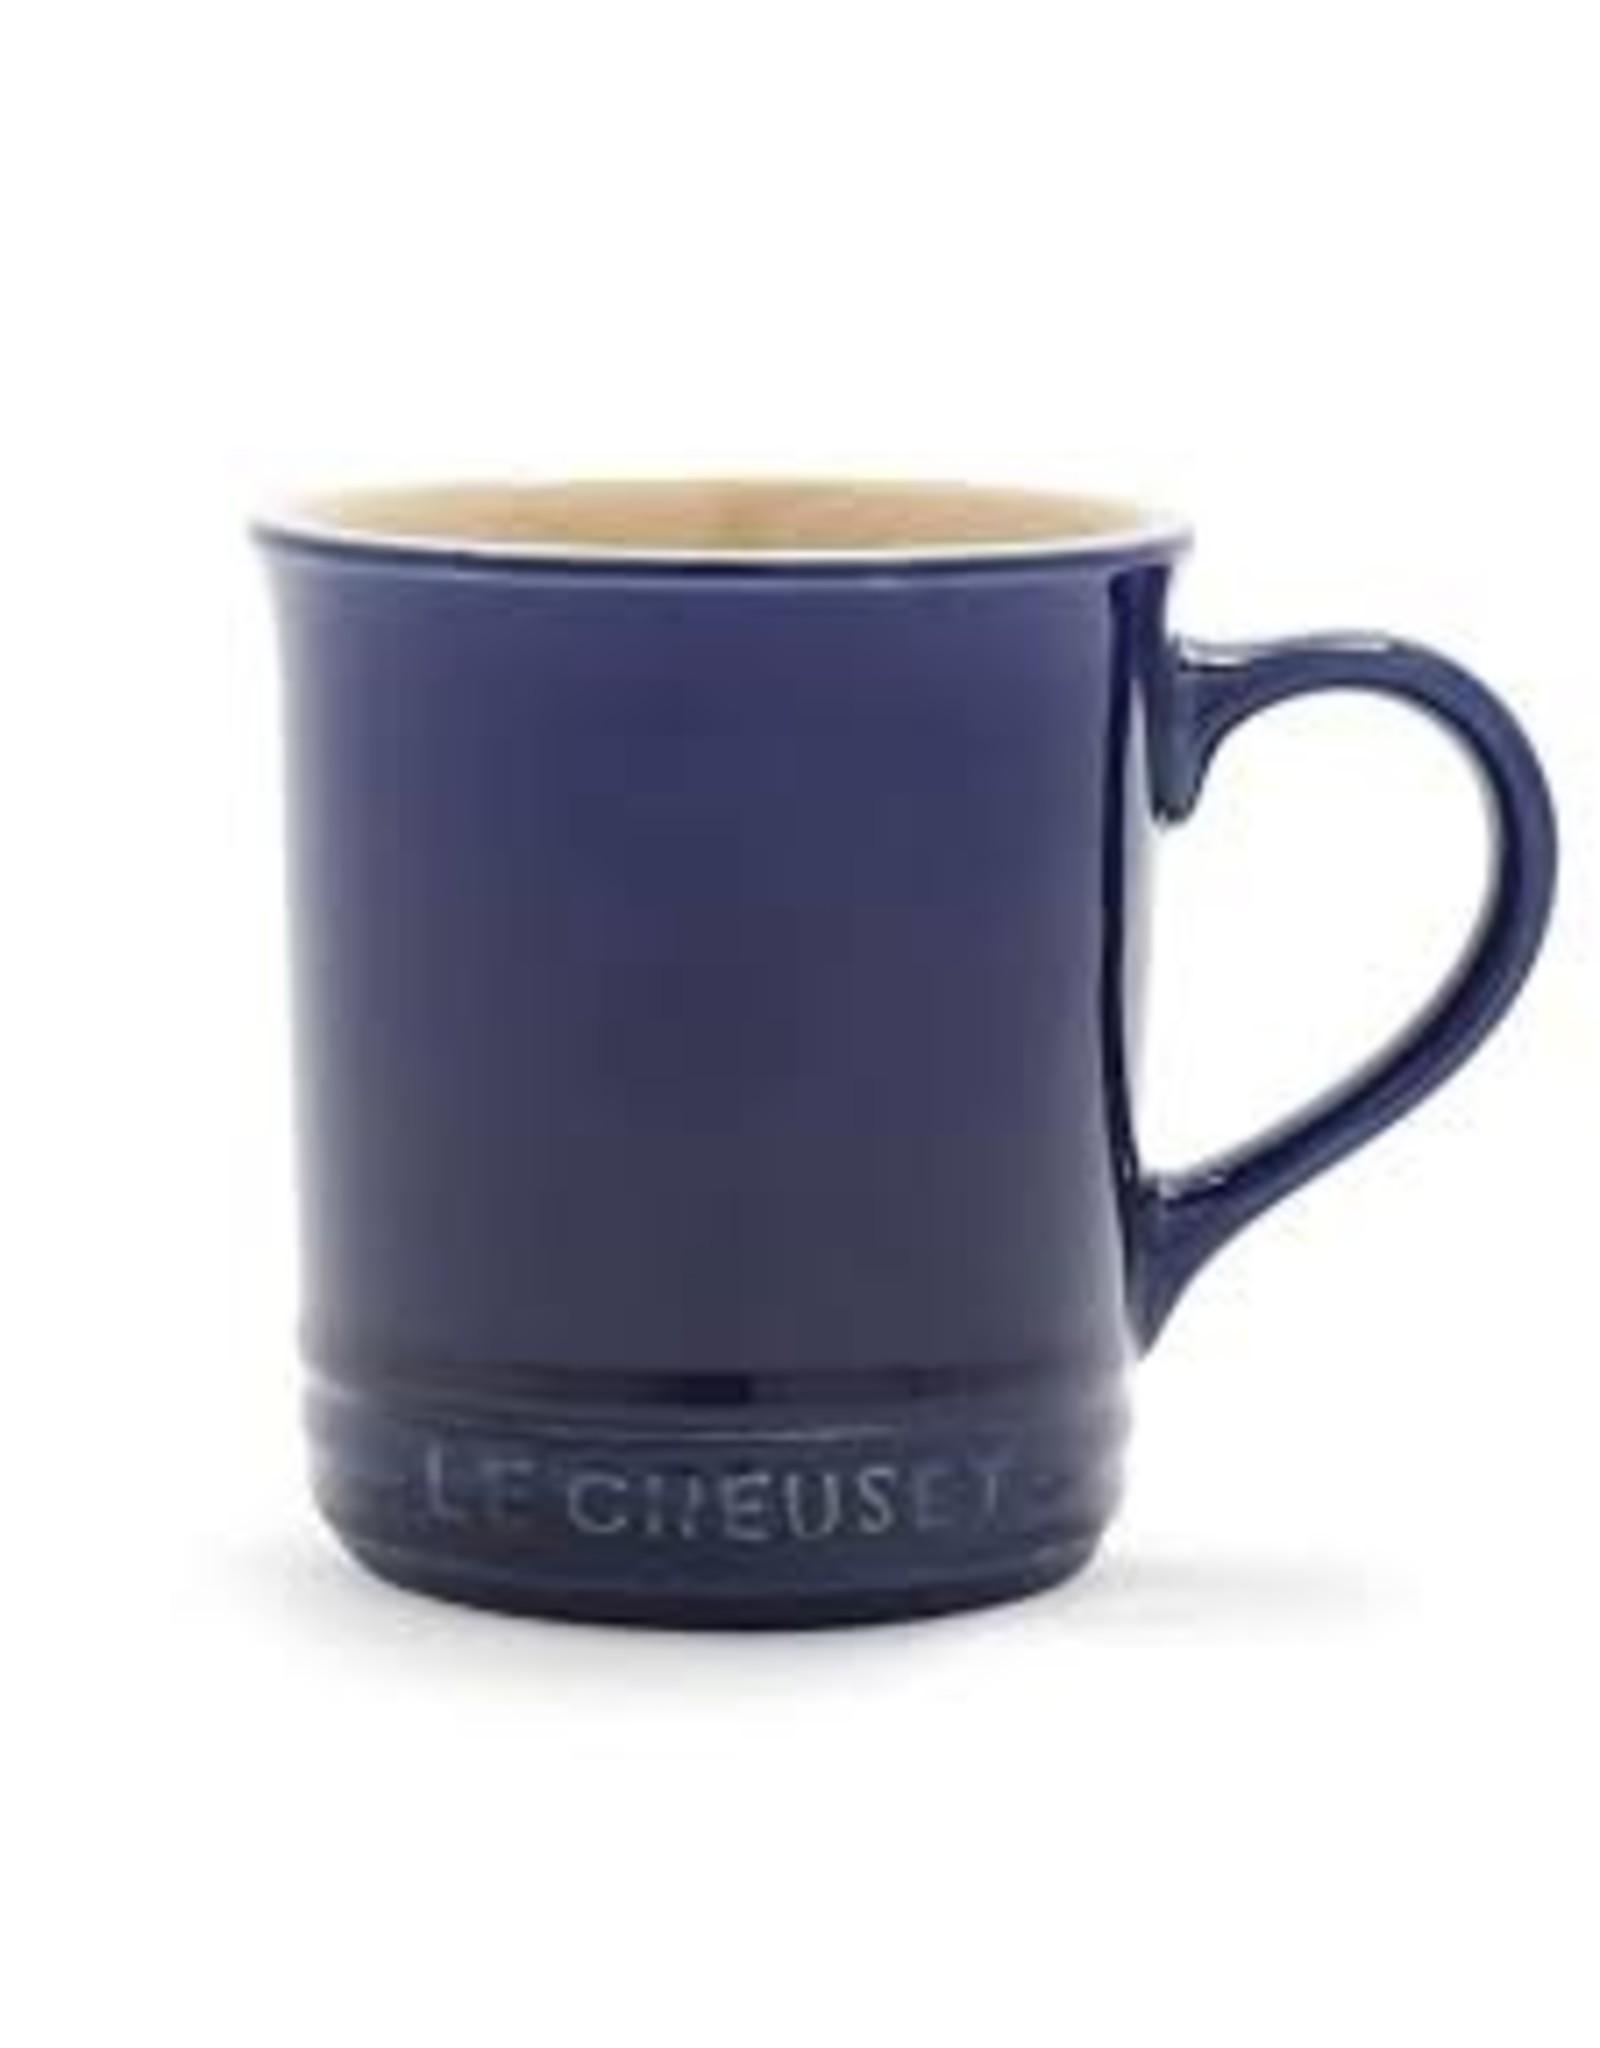 Le Creuset LE CREUSET-Mug indigo